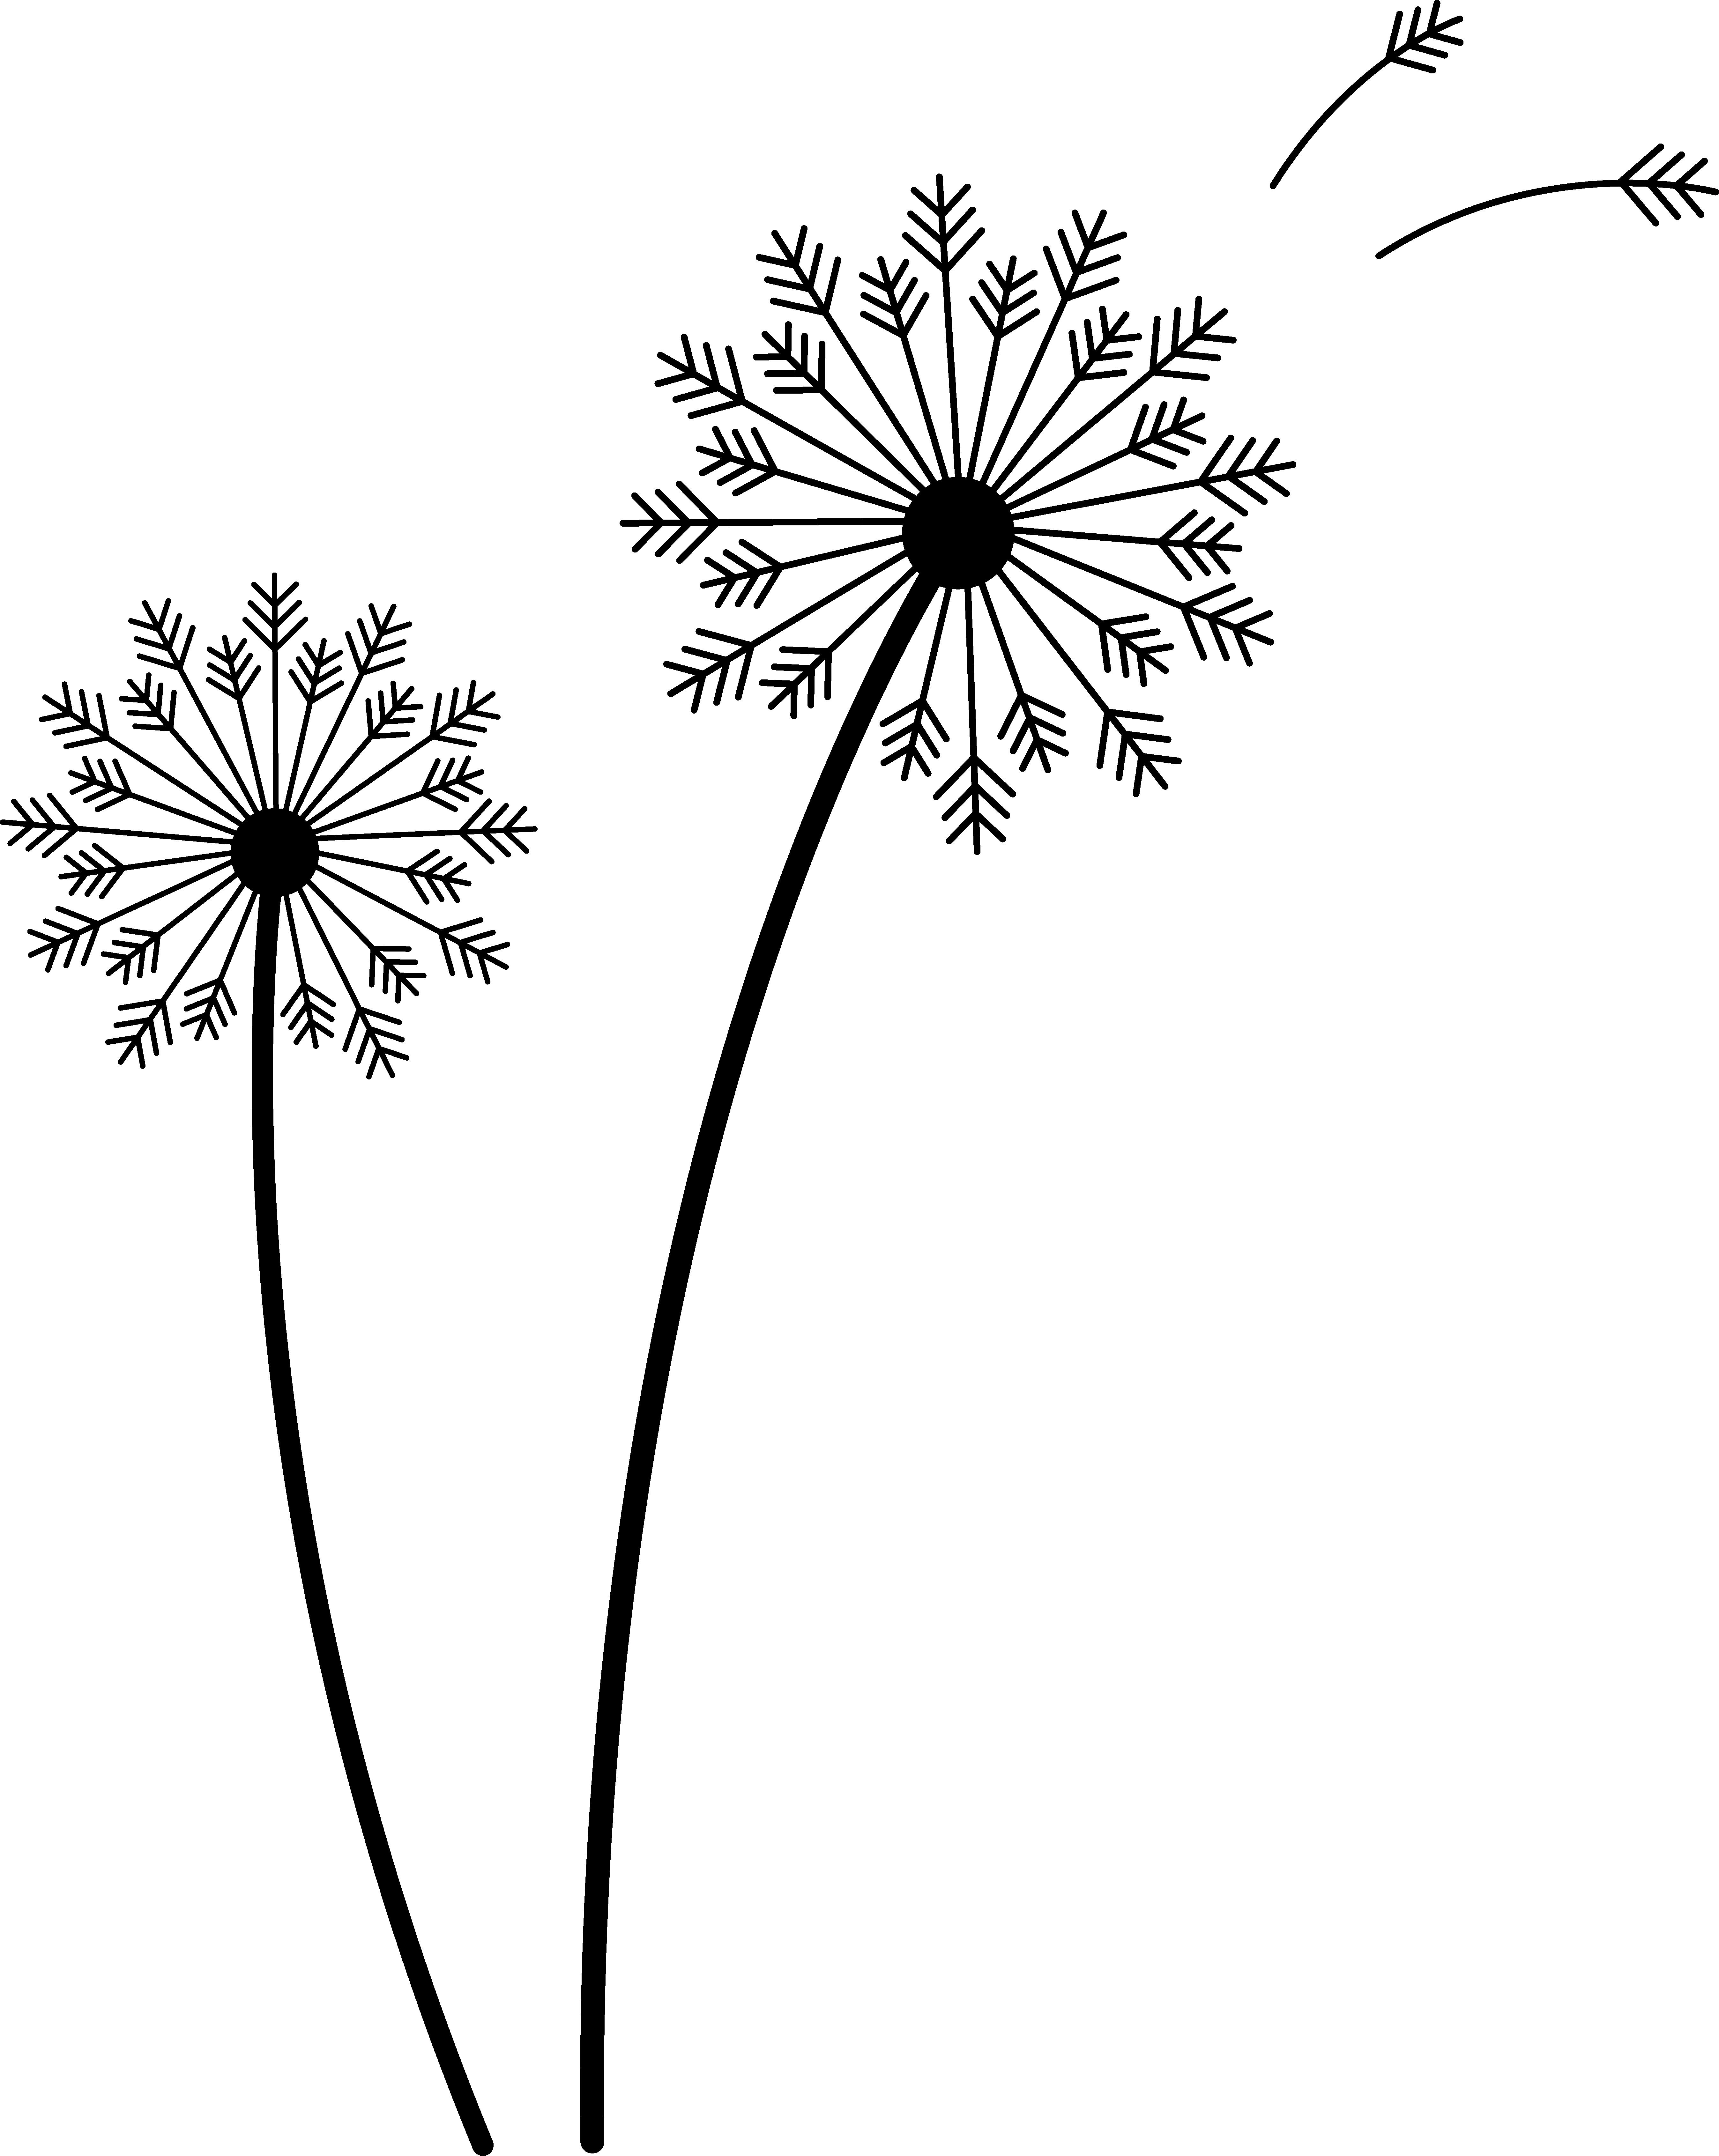 Drawn dandelion silhouette #14